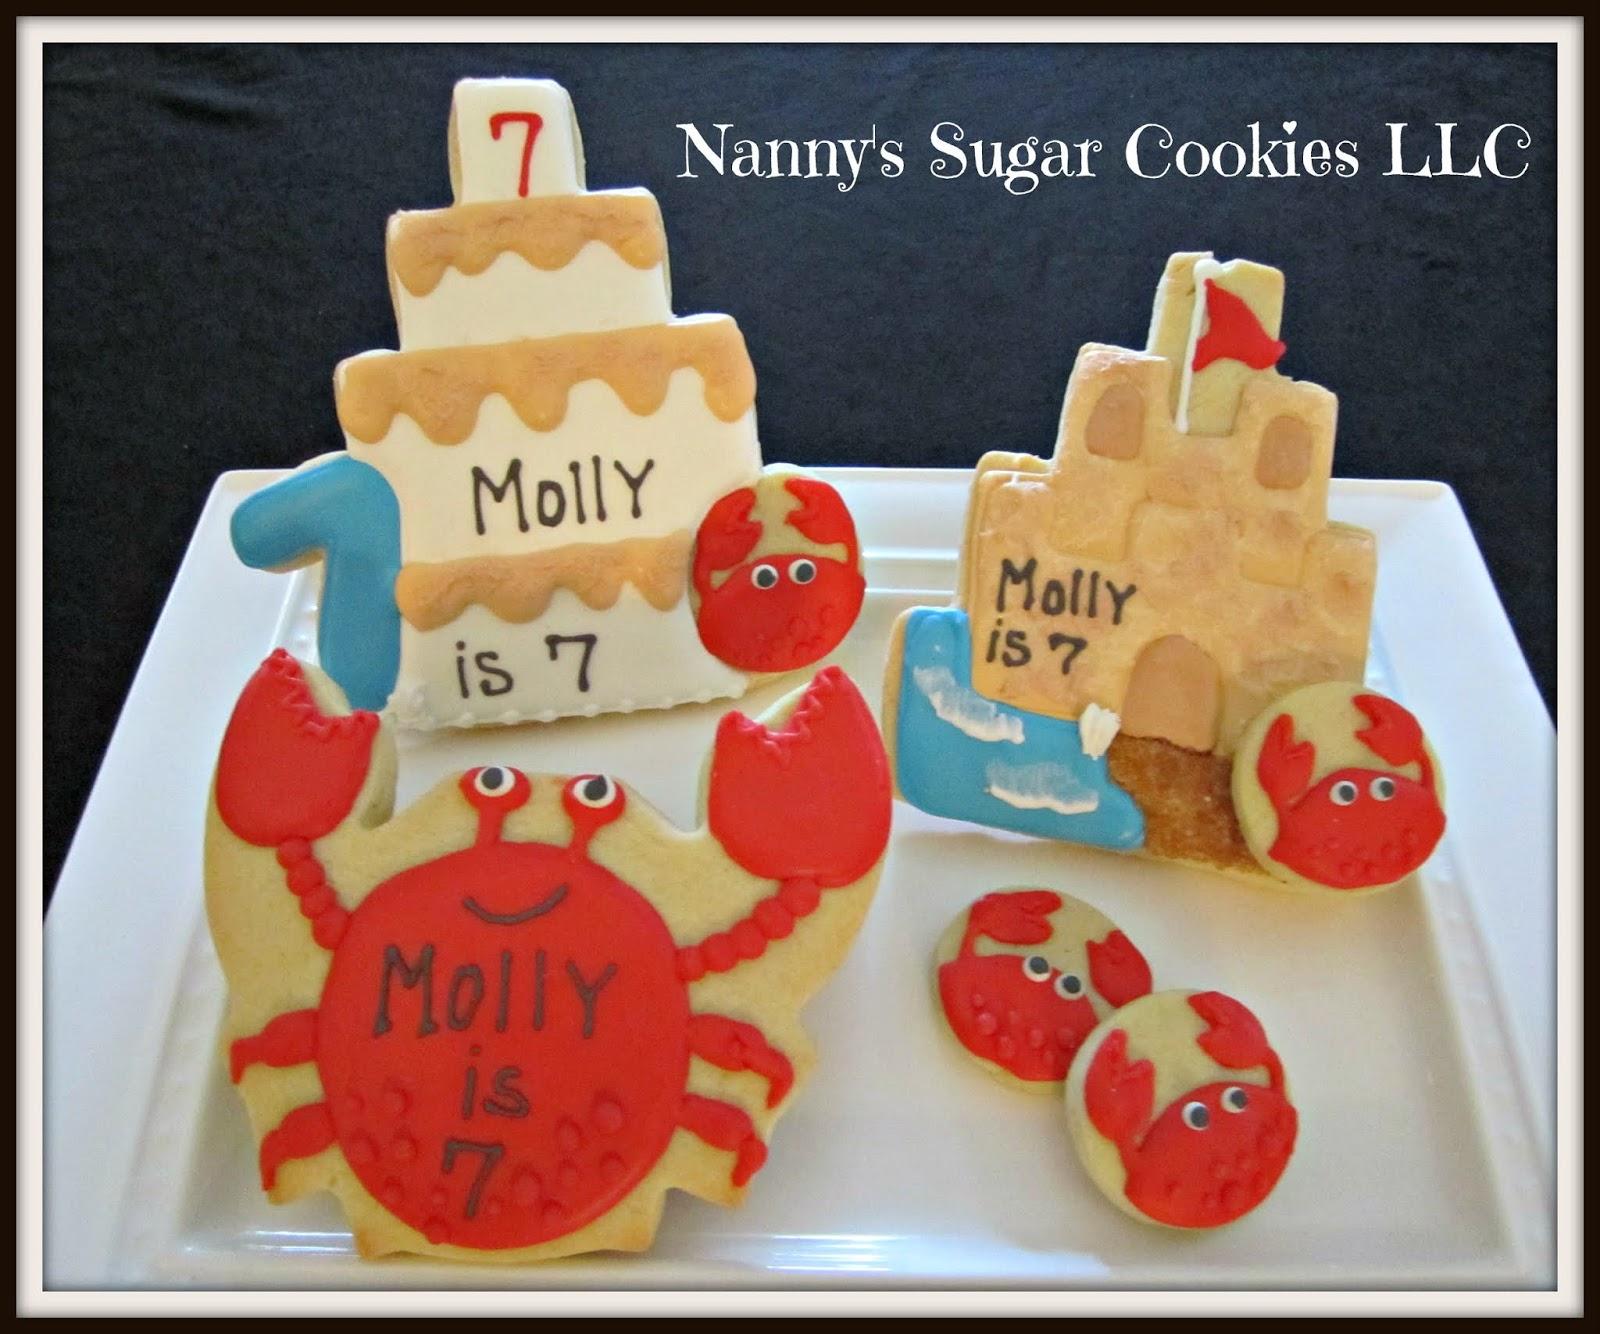 Nannys Sugar Cookies Llc Celebrating A 7th Birthday With Sand